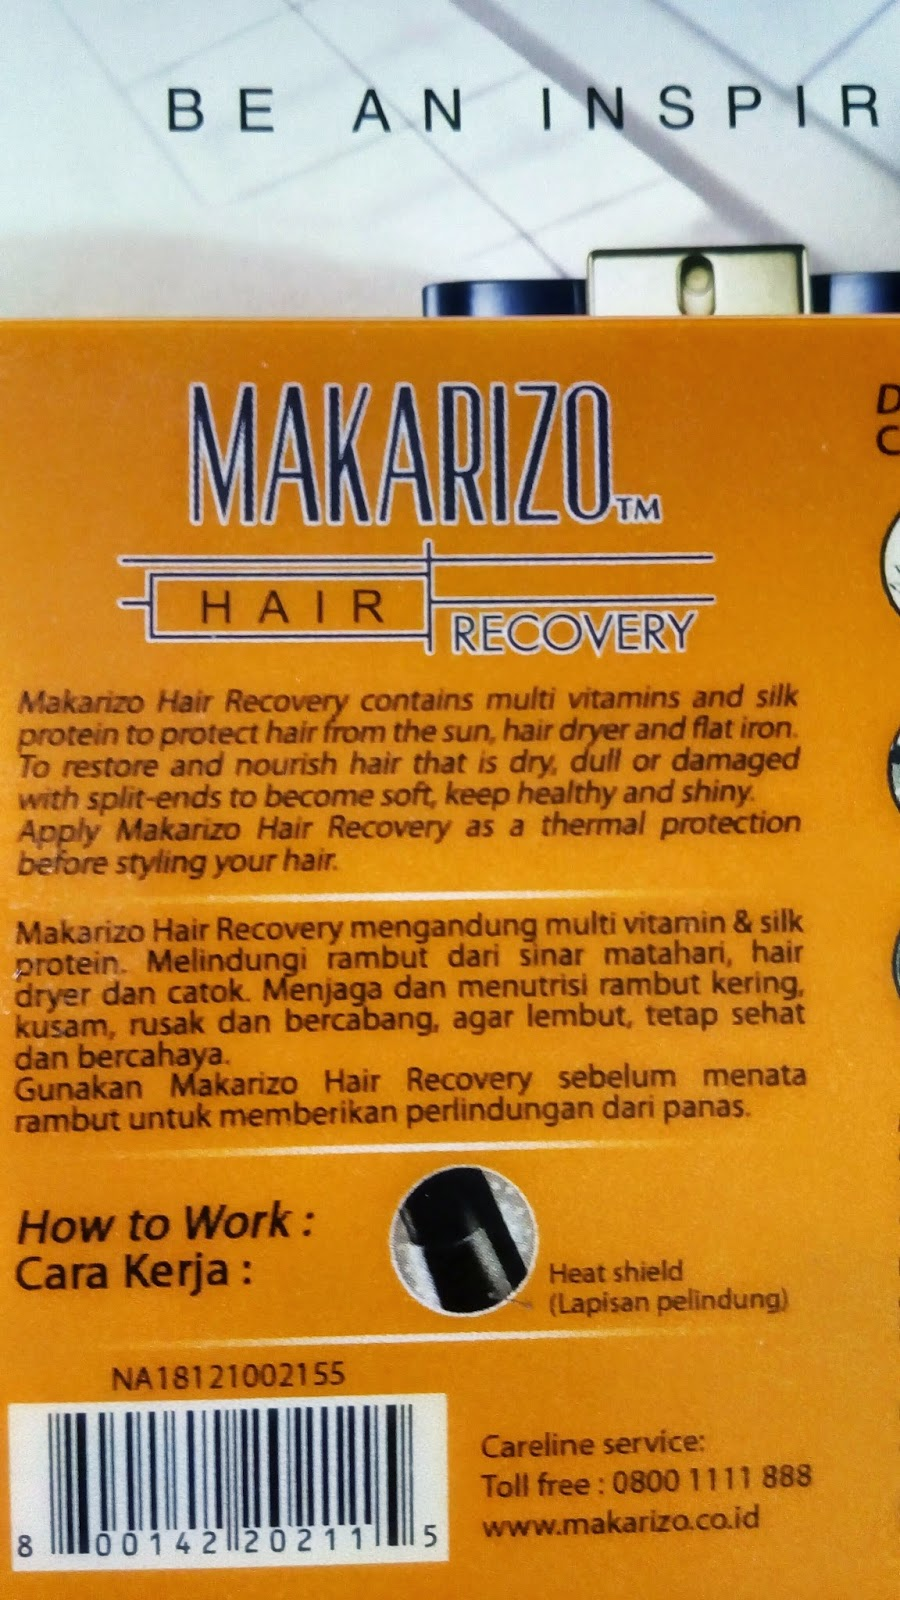 Makarizo Hair Recovery